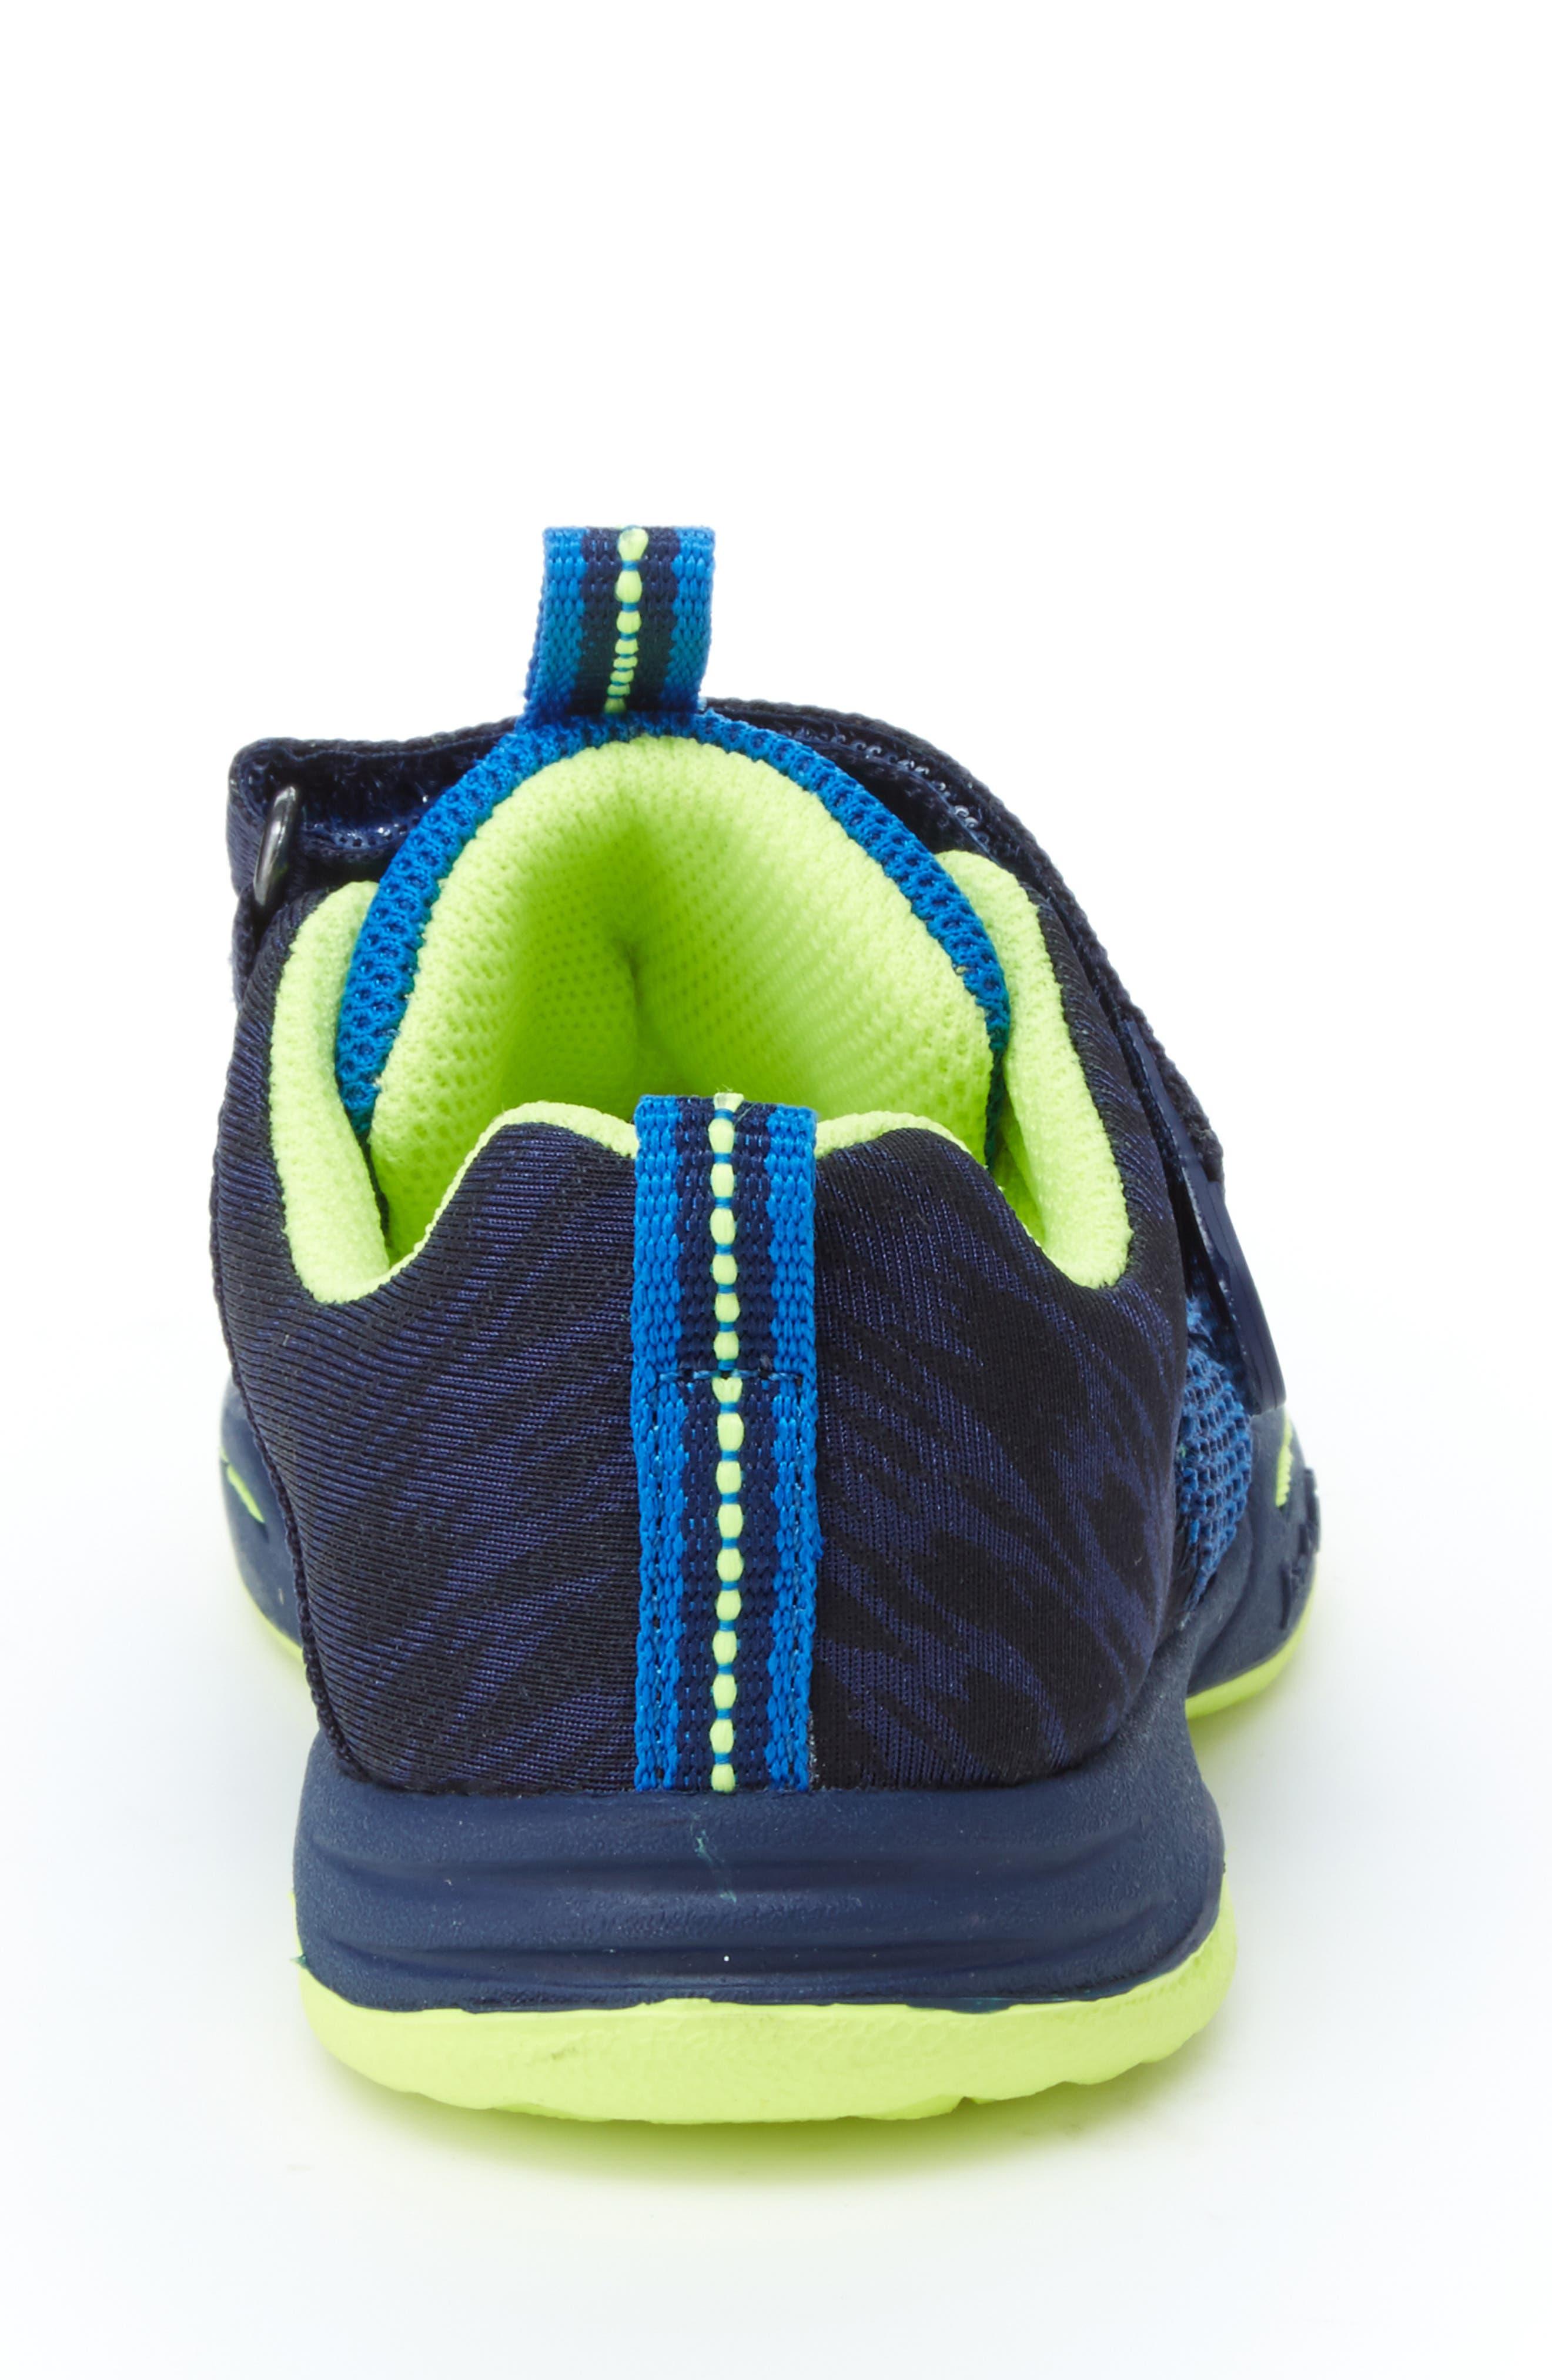 Talon Knit Sneaker,                             Alternate thumbnail 9, color,                             NAVY TEXTILE